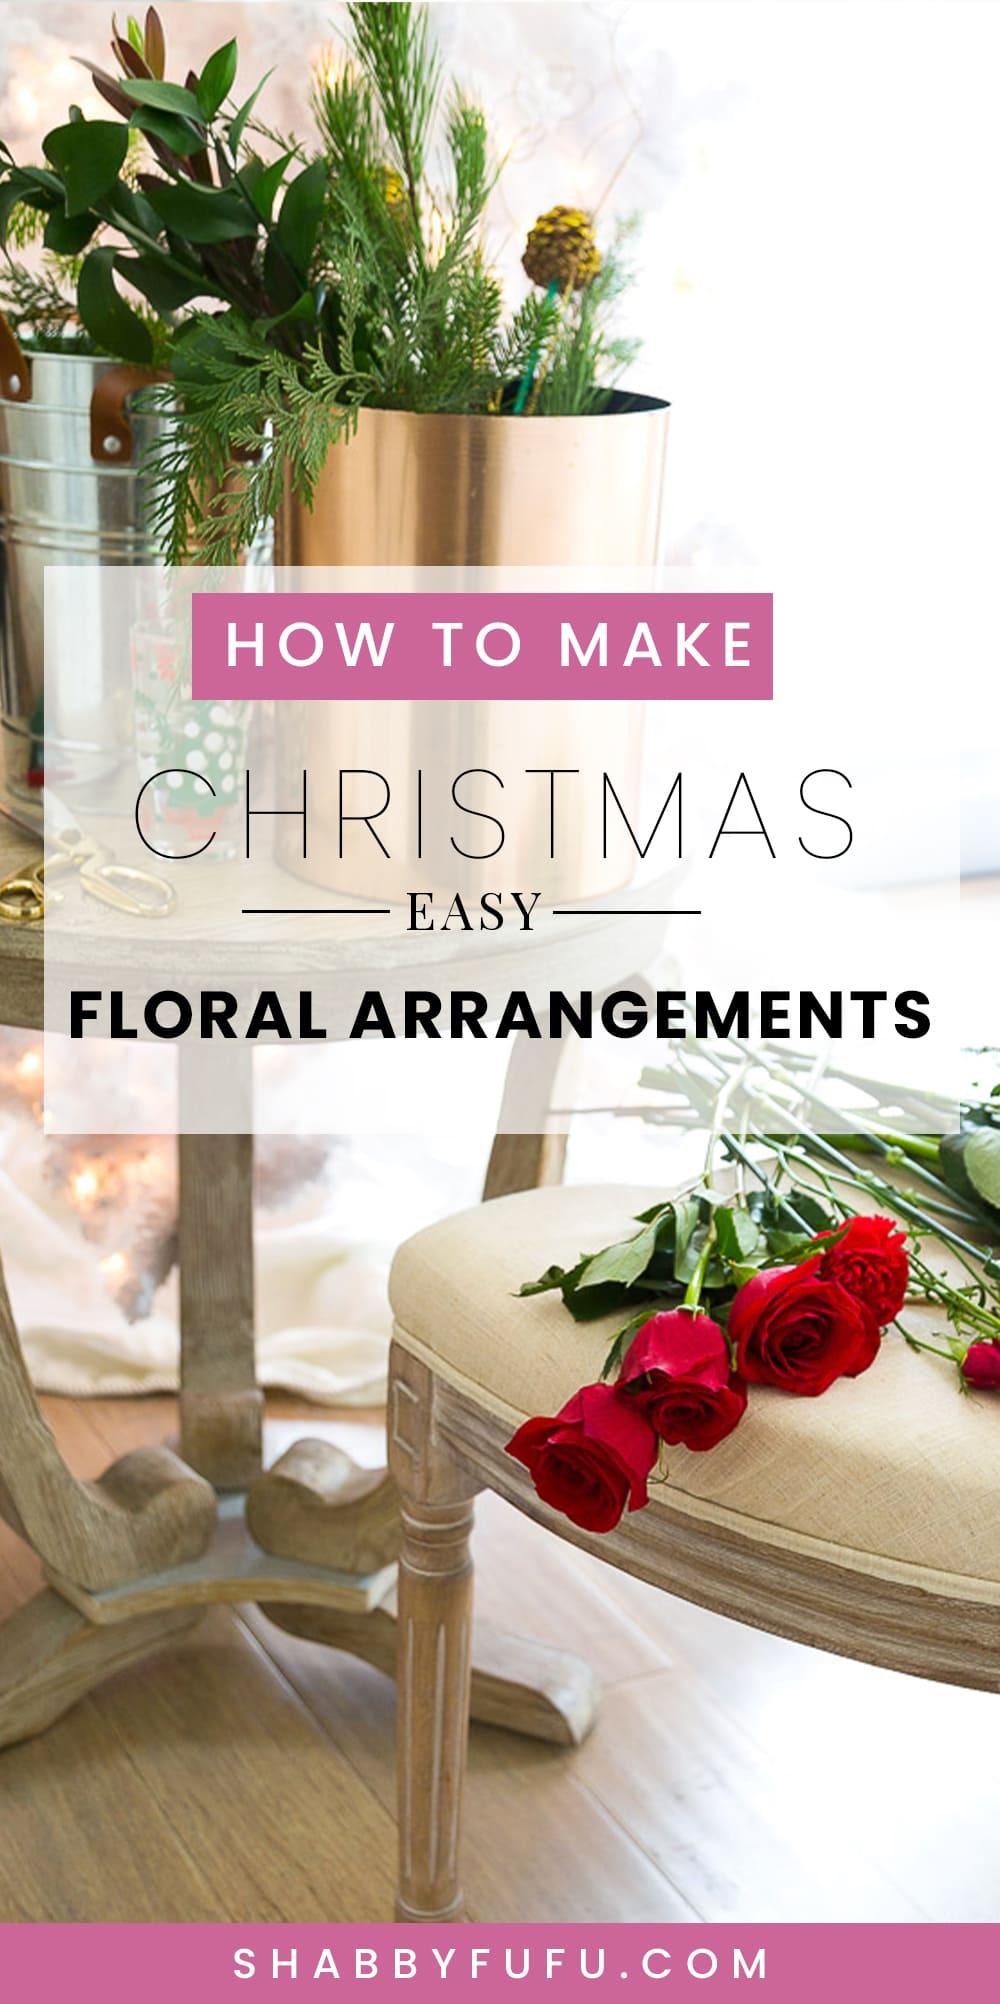 How To DIY Flower Arrangements For Friends